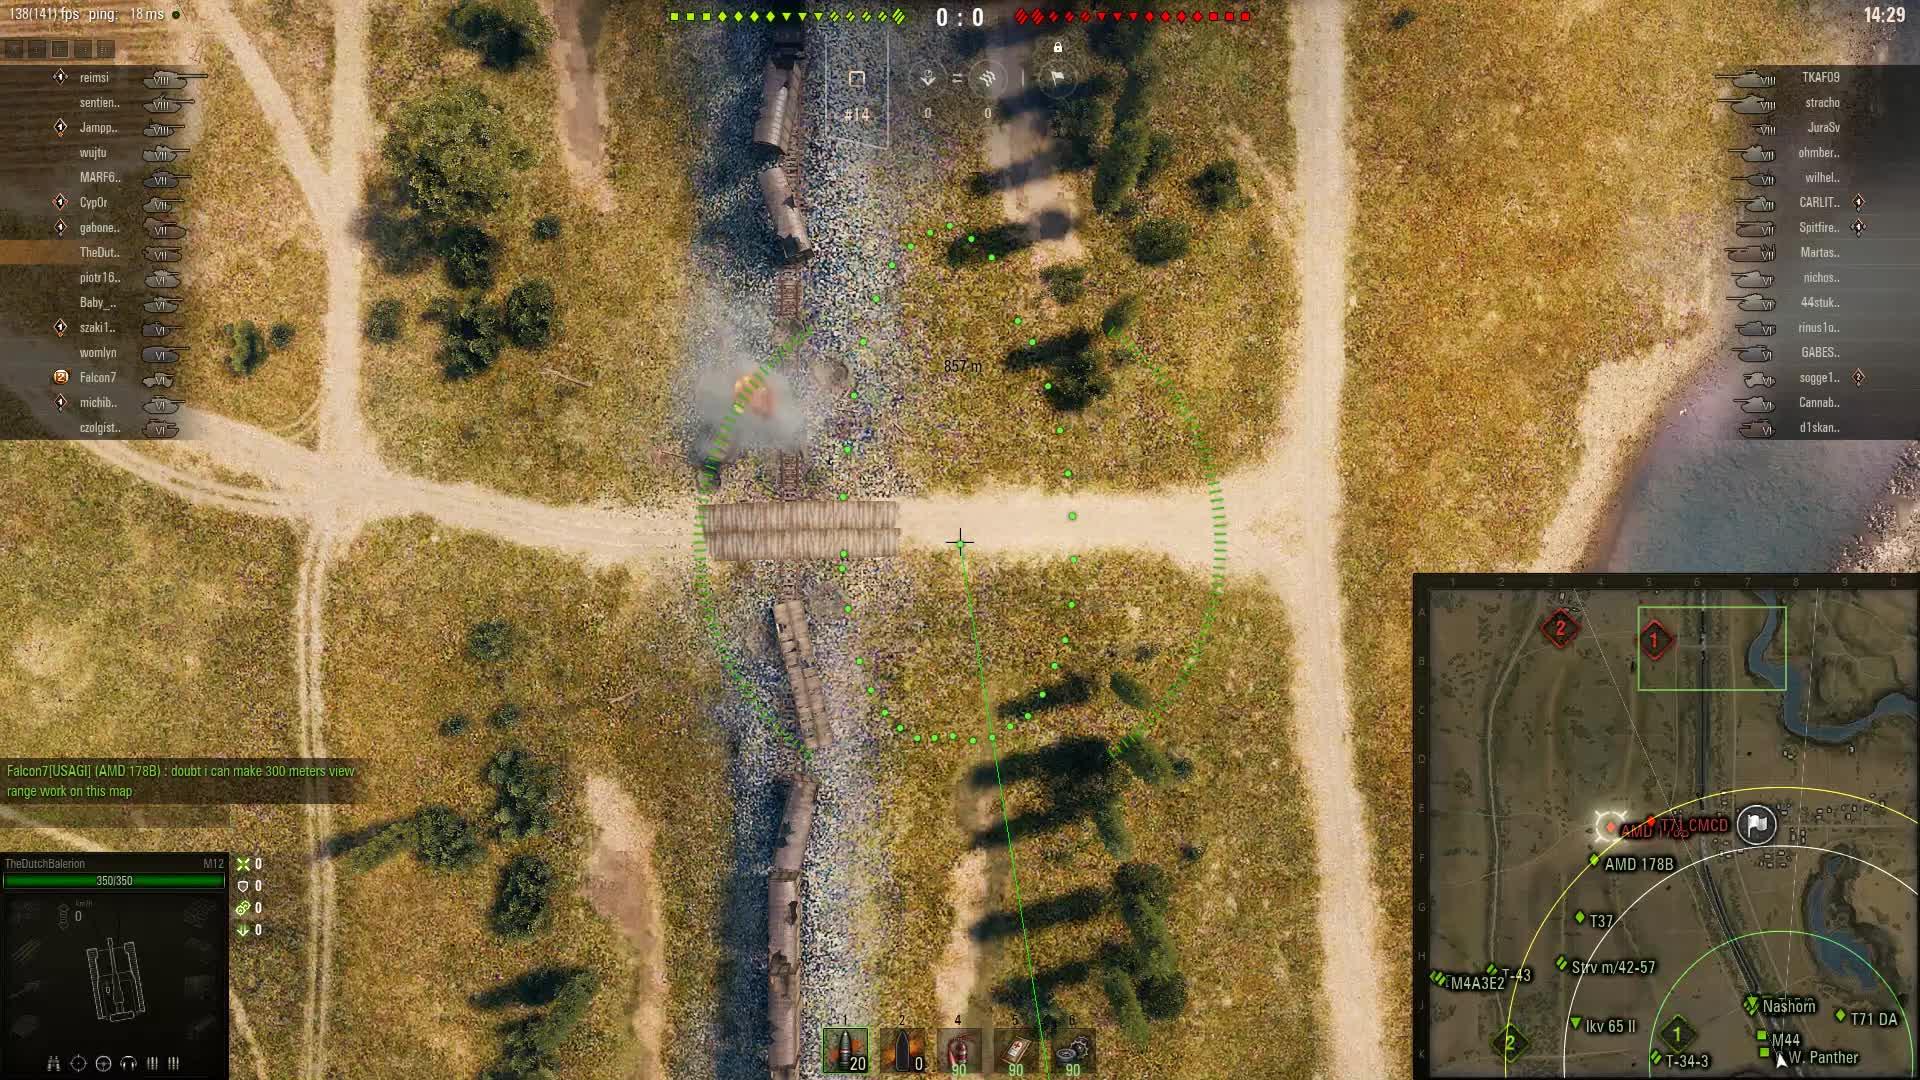 worldoftanks, World of Tanks 2019.02.06 - 10.43.11.02 GIFs